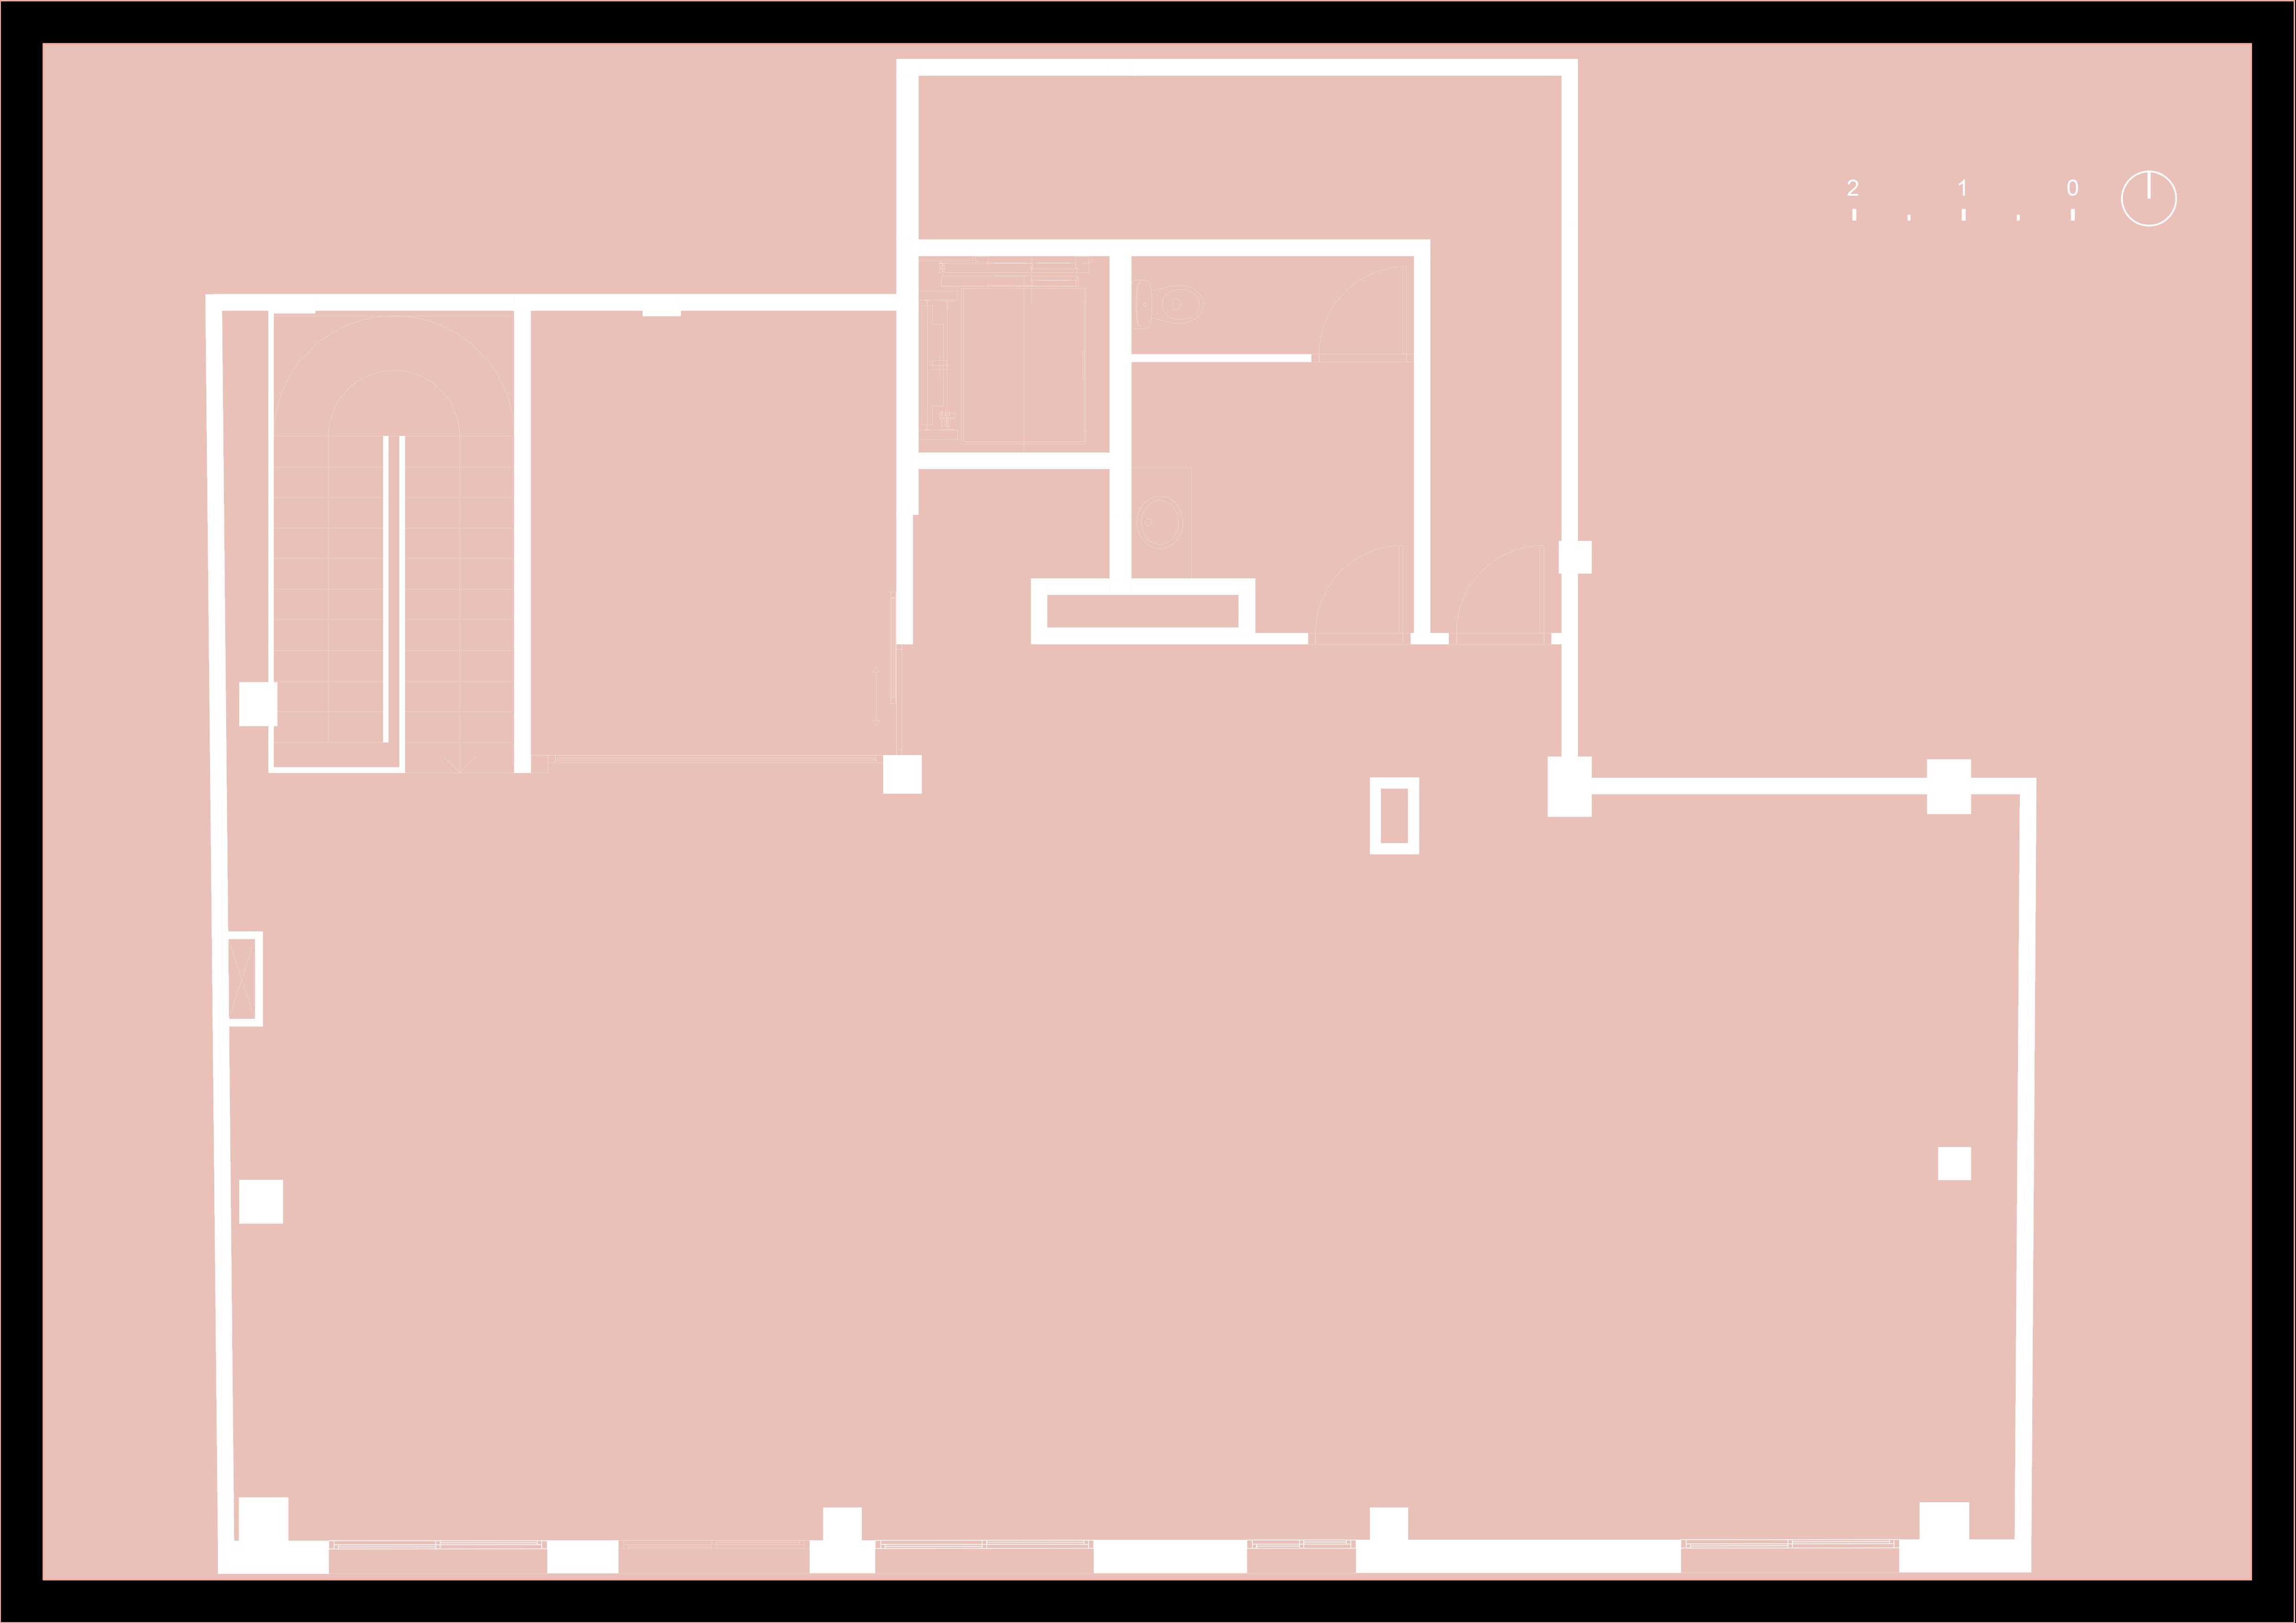 ANDREW-STAFFING-PLANO1-BEFORE-INSAYN-DESIGN-SOCIETY